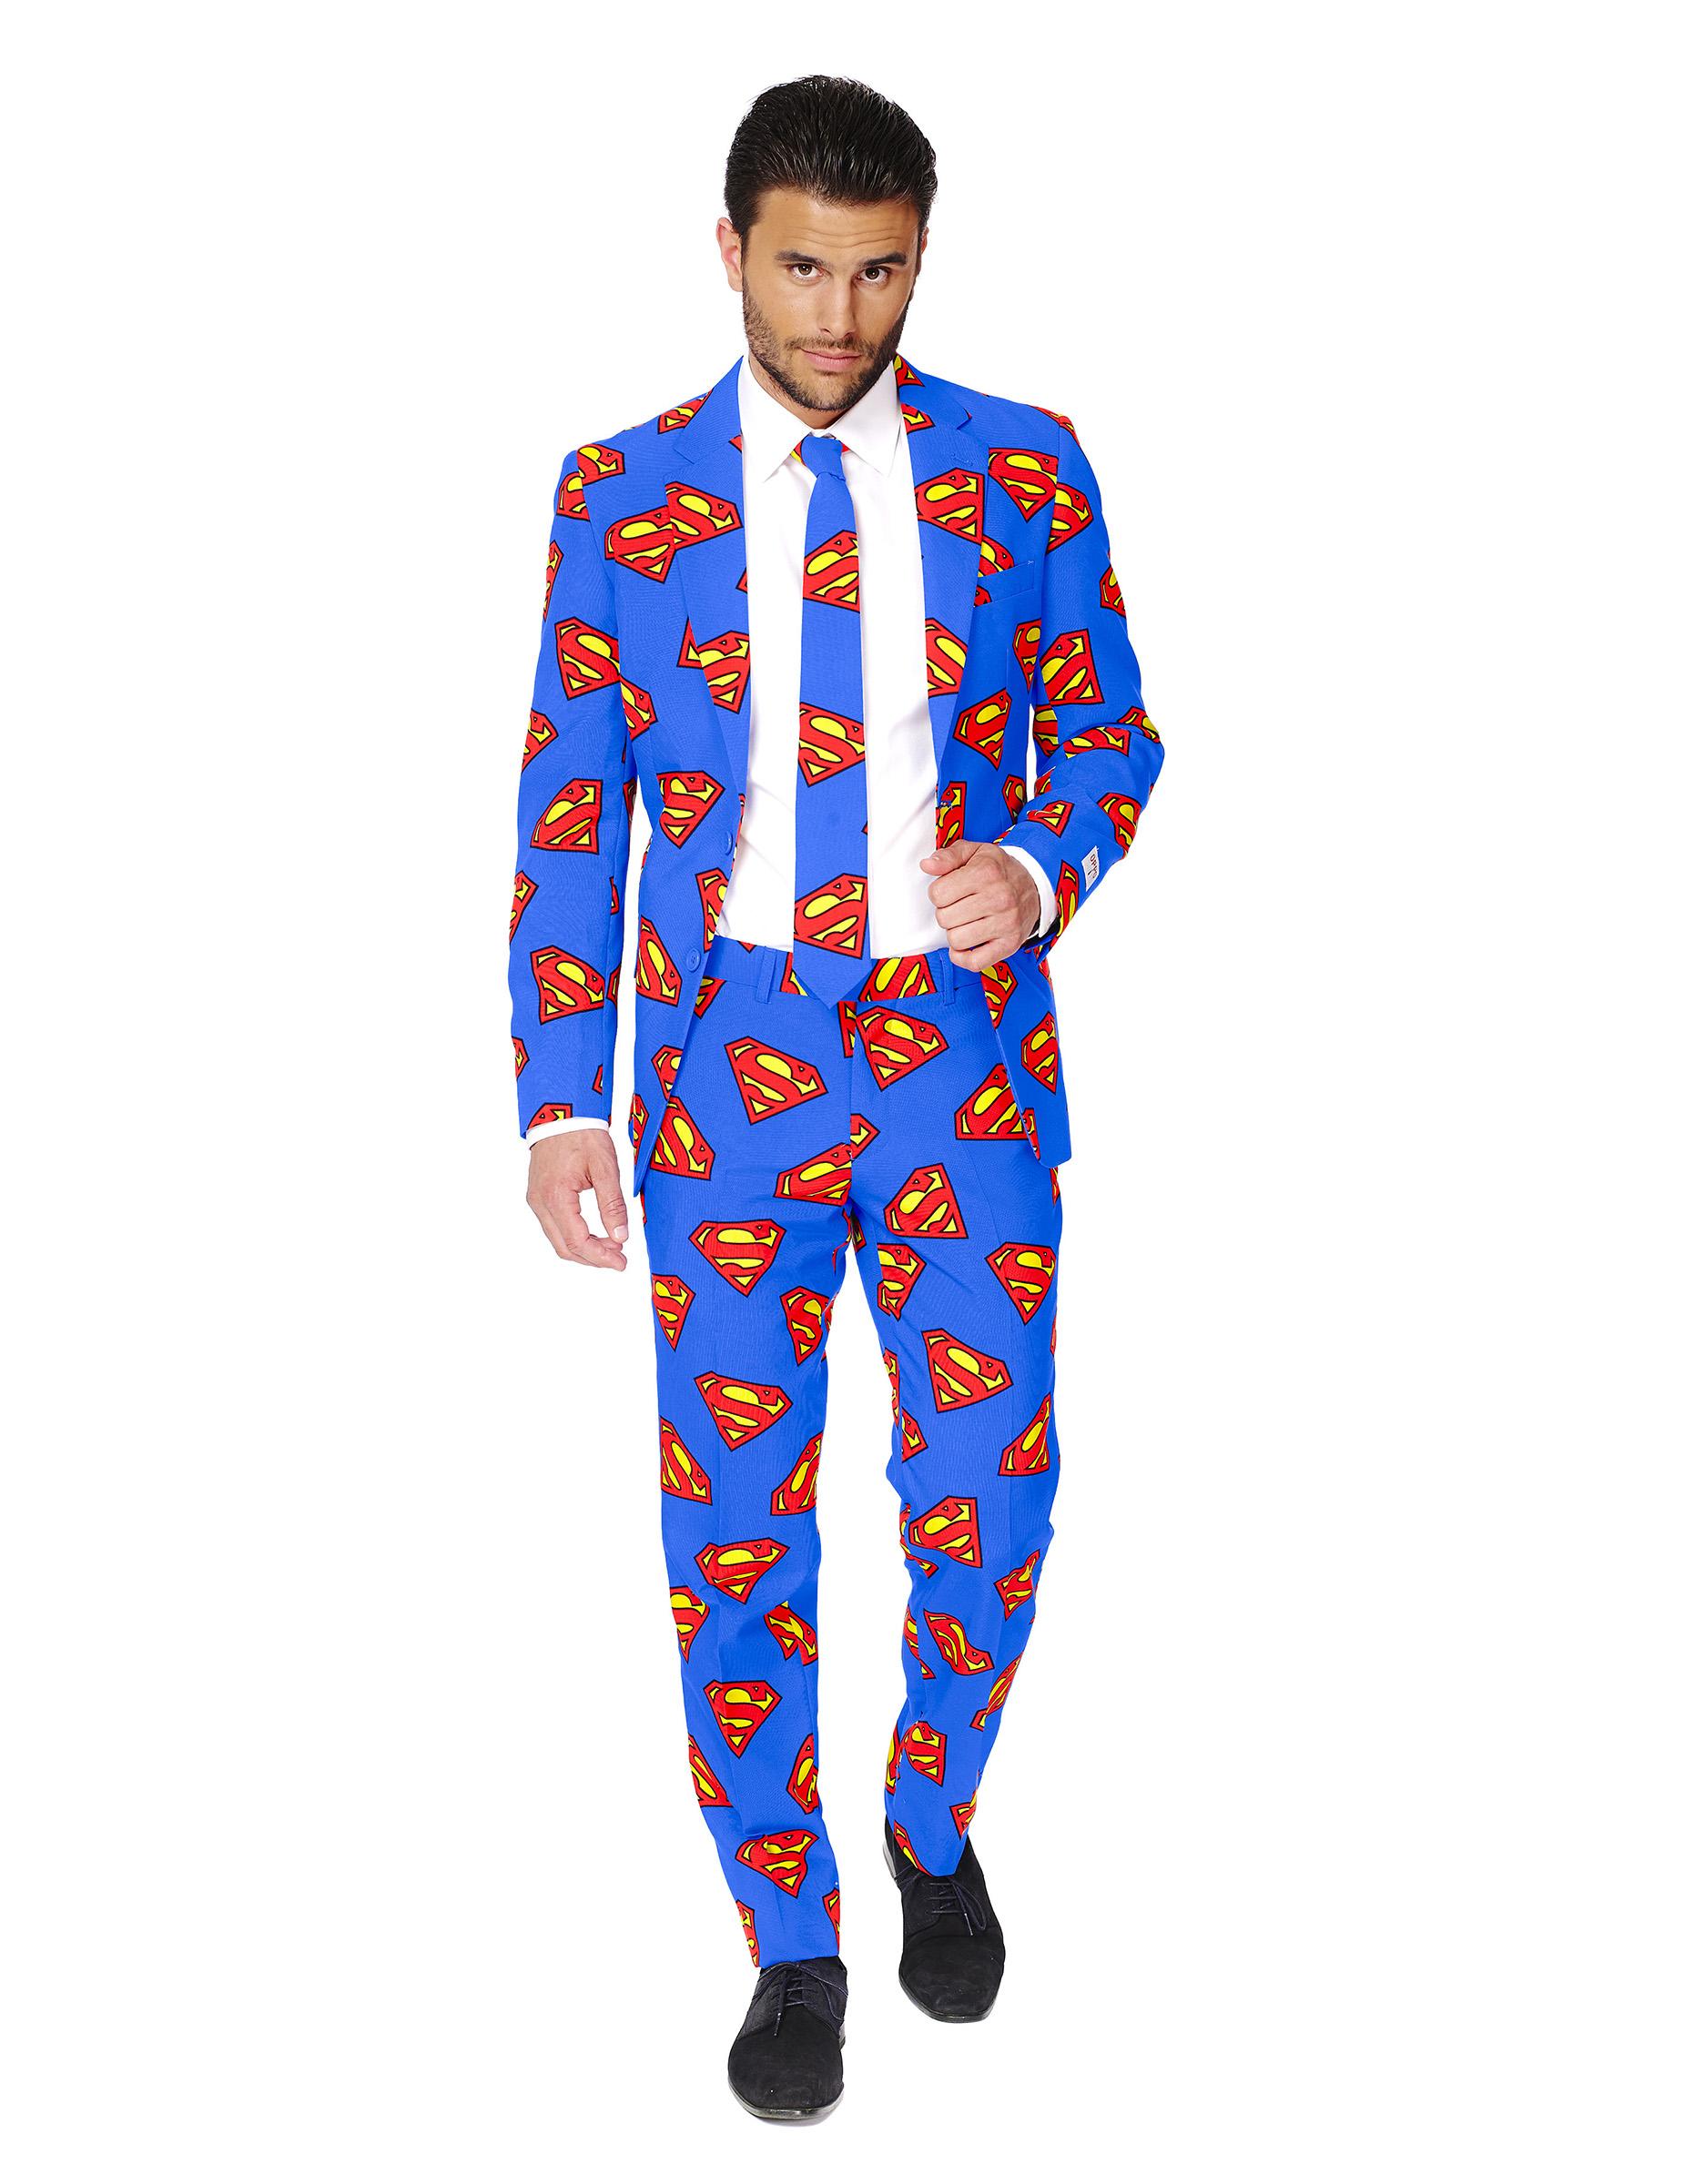 costume mr superman homme opposuits achat de d guisements adultes sur vegaoopro grossiste. Black Bedroom Furniture Sets. Home Design Ideas